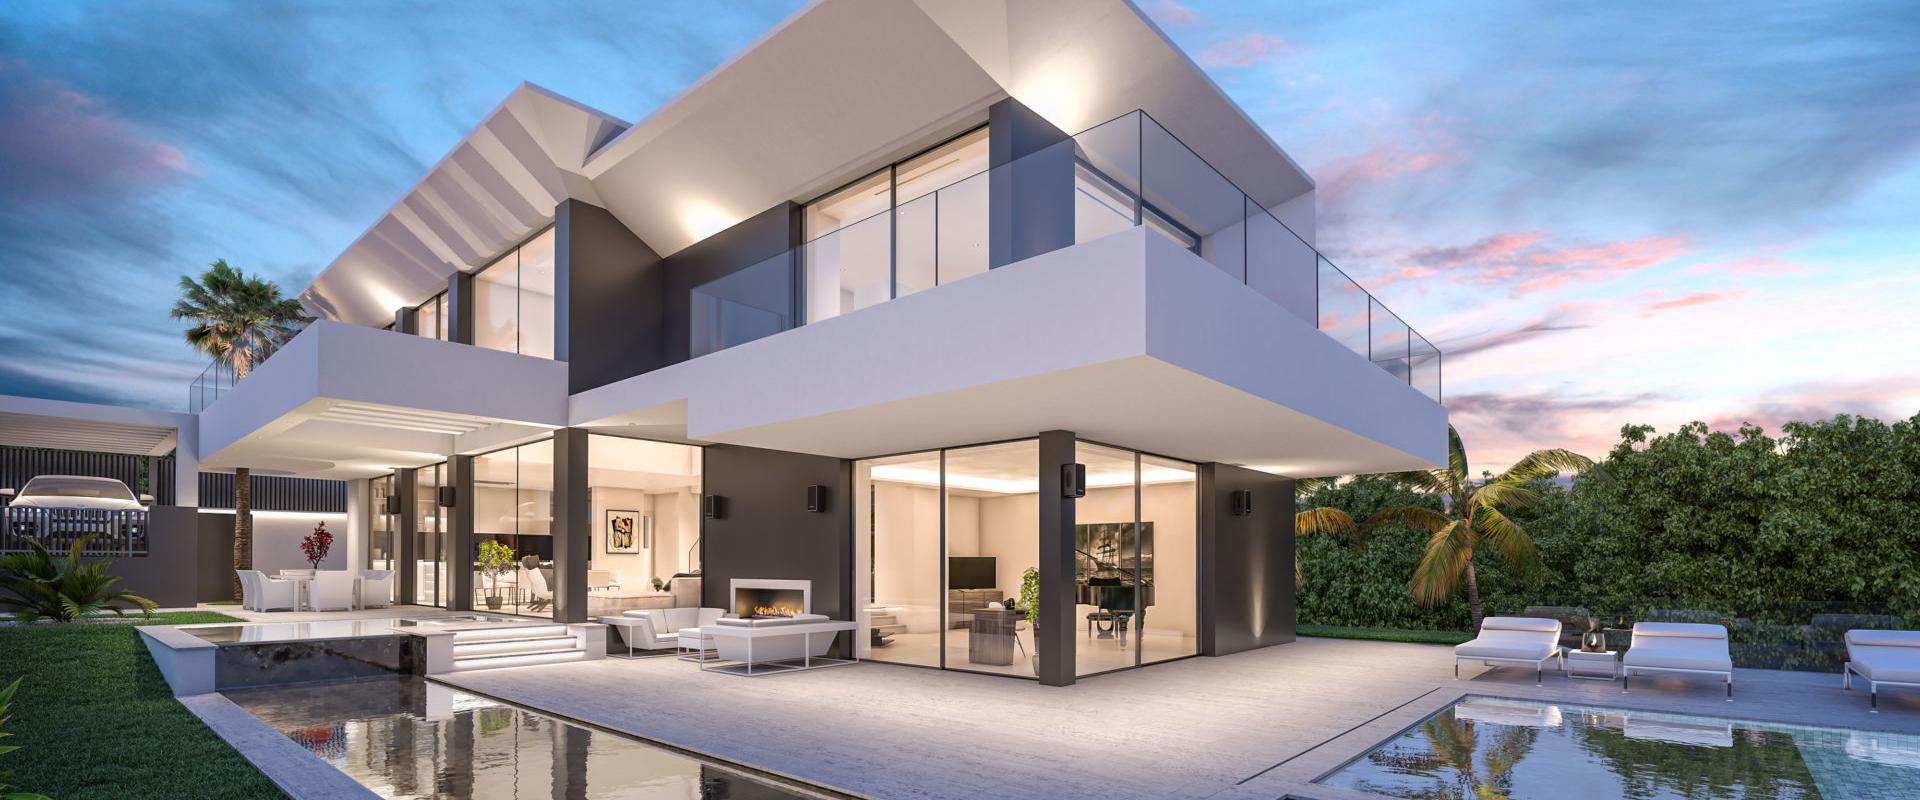 Modern Luxury Villas Hinojo 92 Marbella Builders Architects Thumb 1920x1080 1